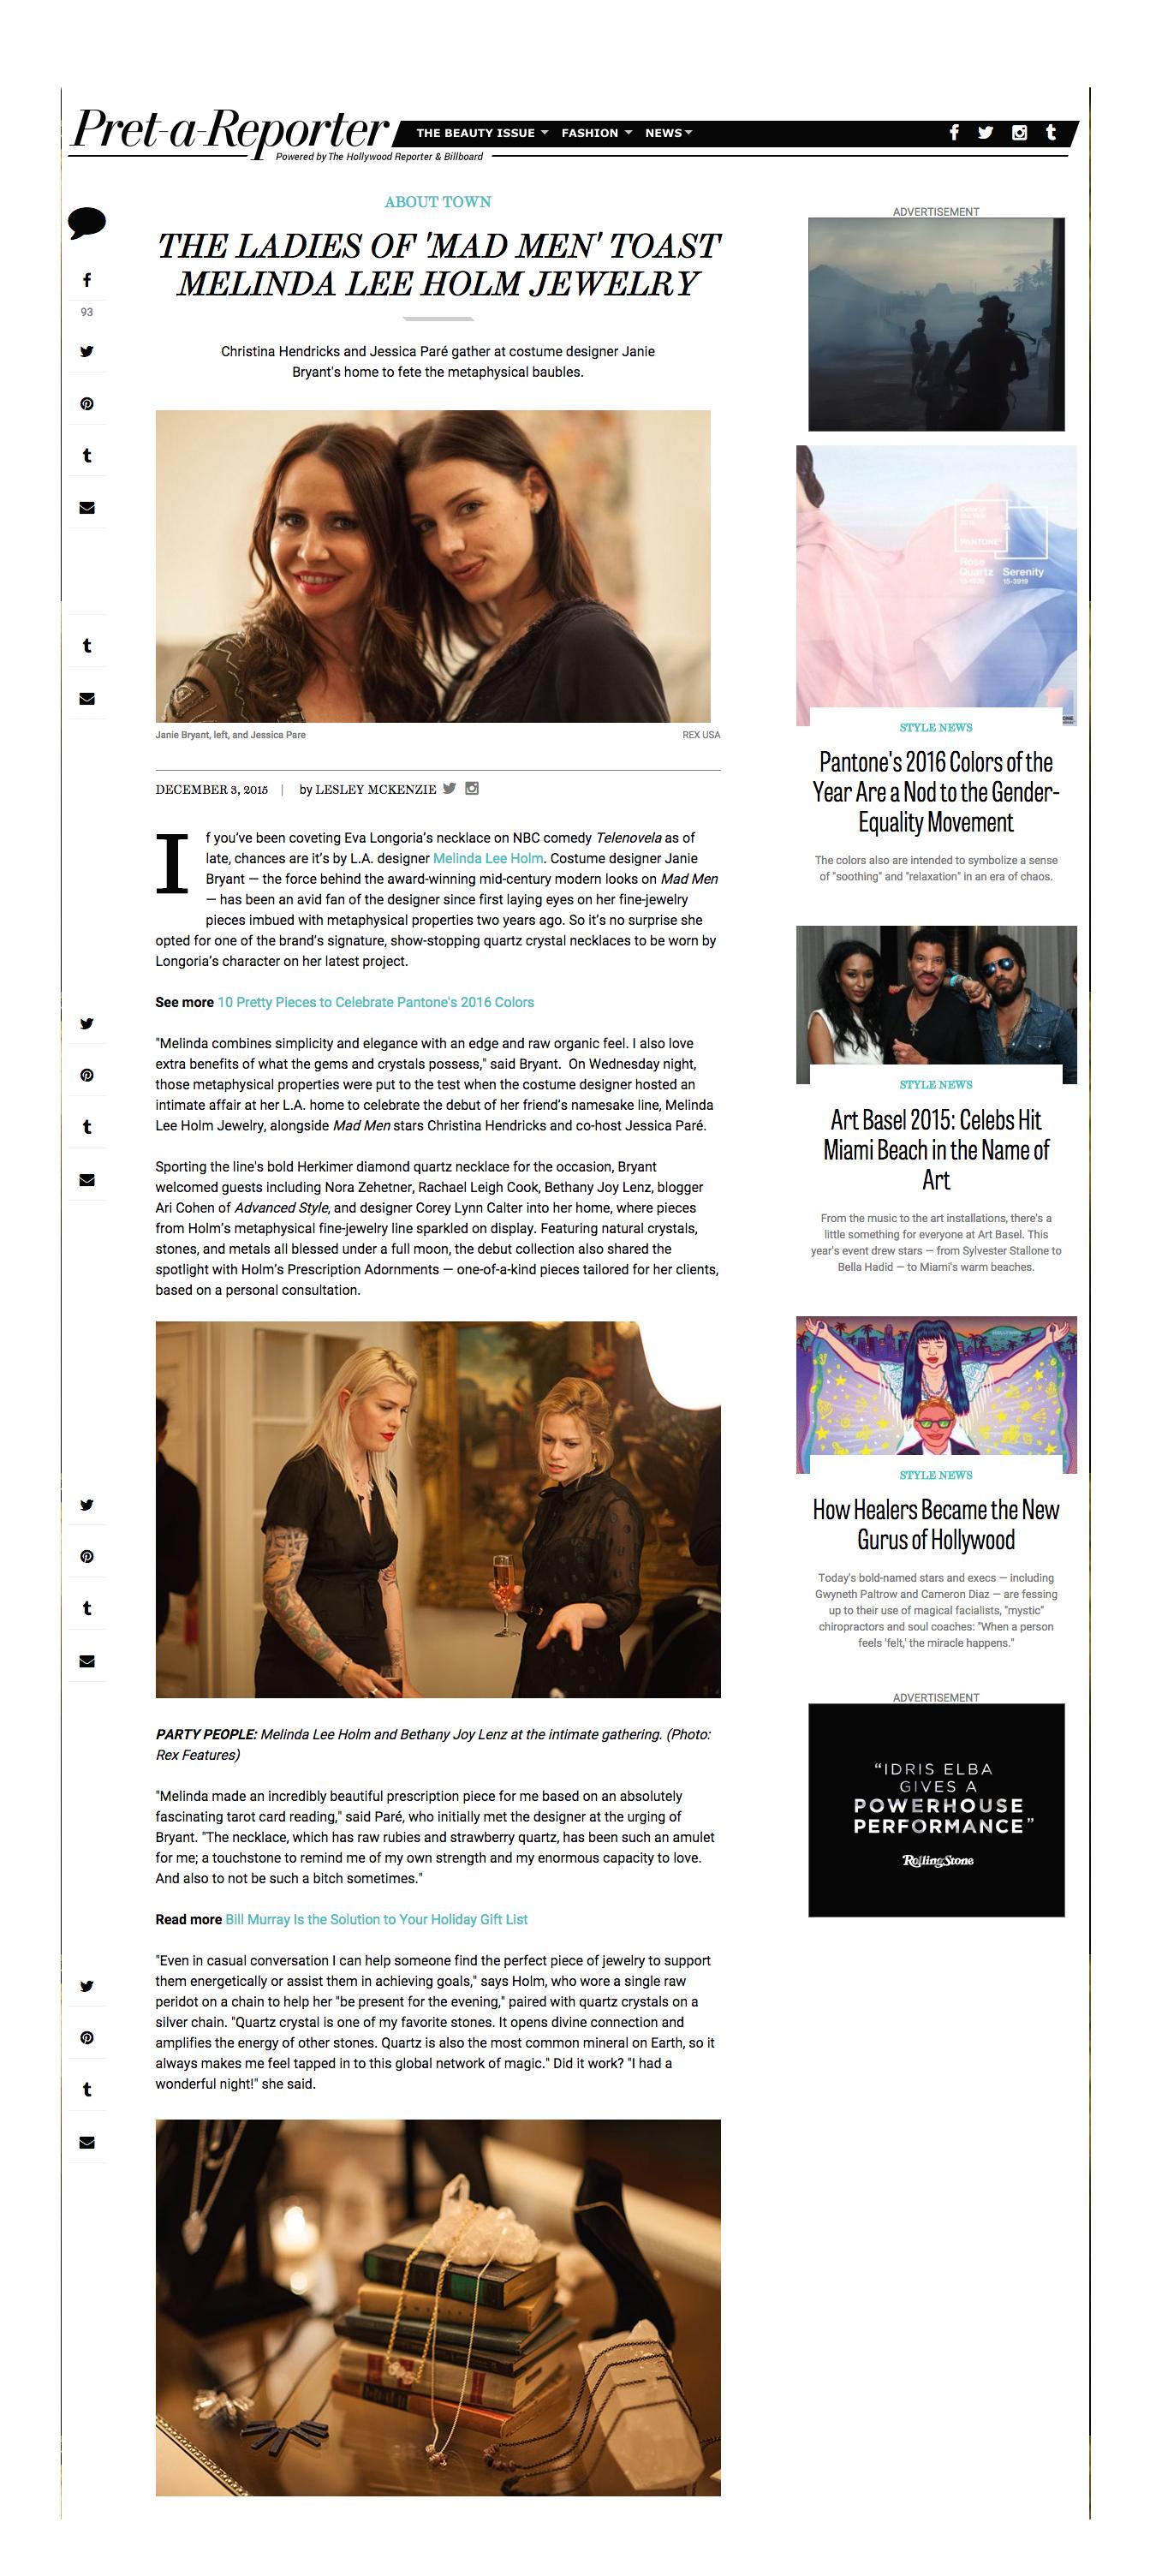 The Ladies of 'Mad Men' Toast Melinda Lee Holm Jewelry   HollywoodReporter.com December 3, 2015